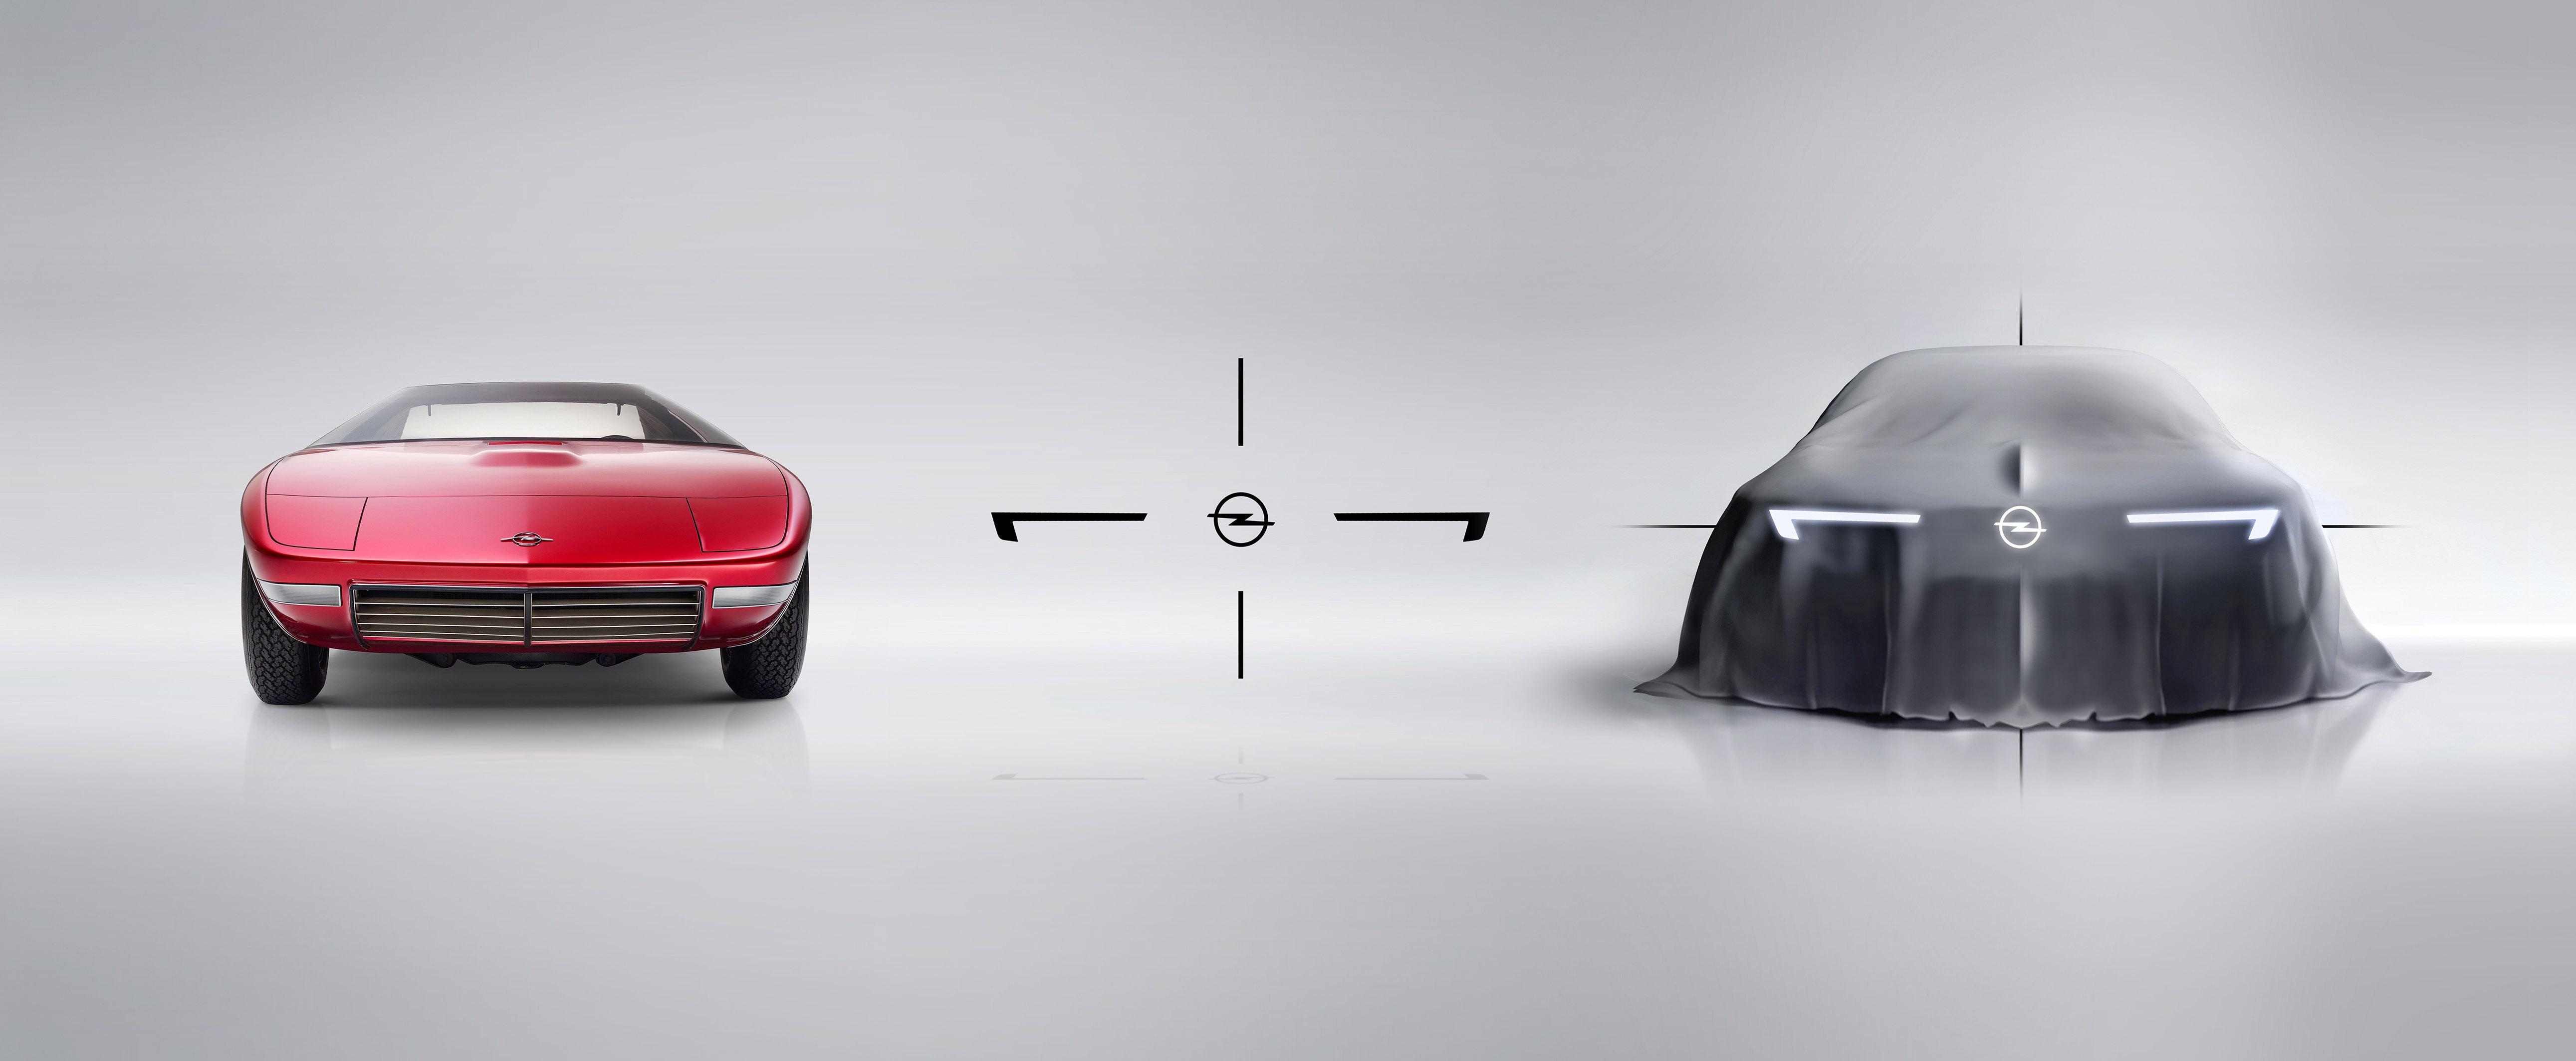 Opel: protótipo revelará o design da marca para o futuro